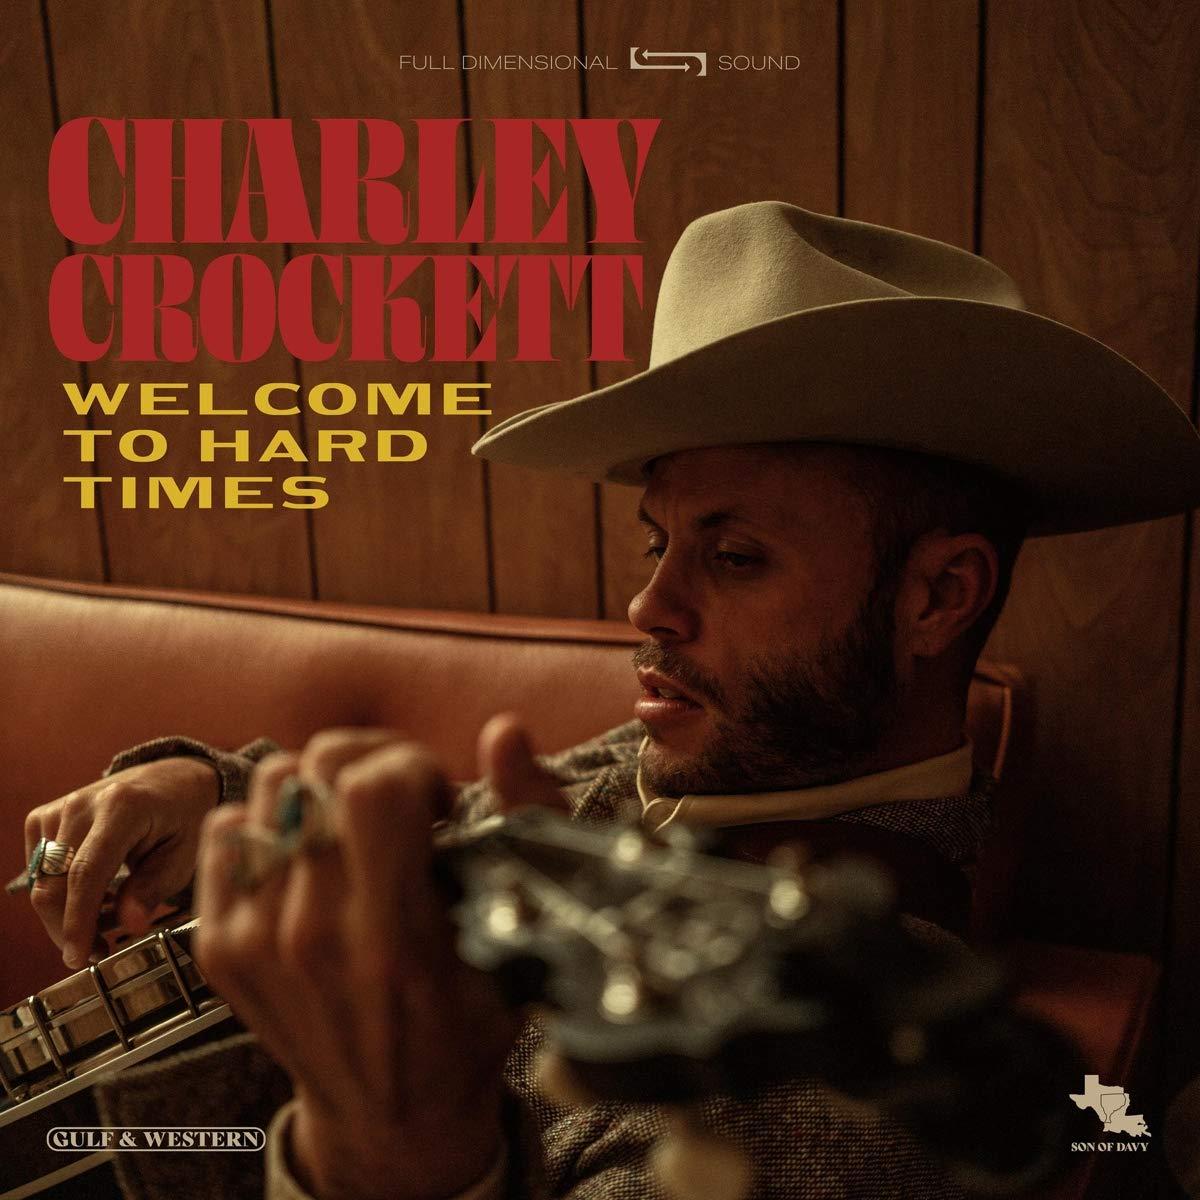 Charley Crockett: Welcome to Hard Times